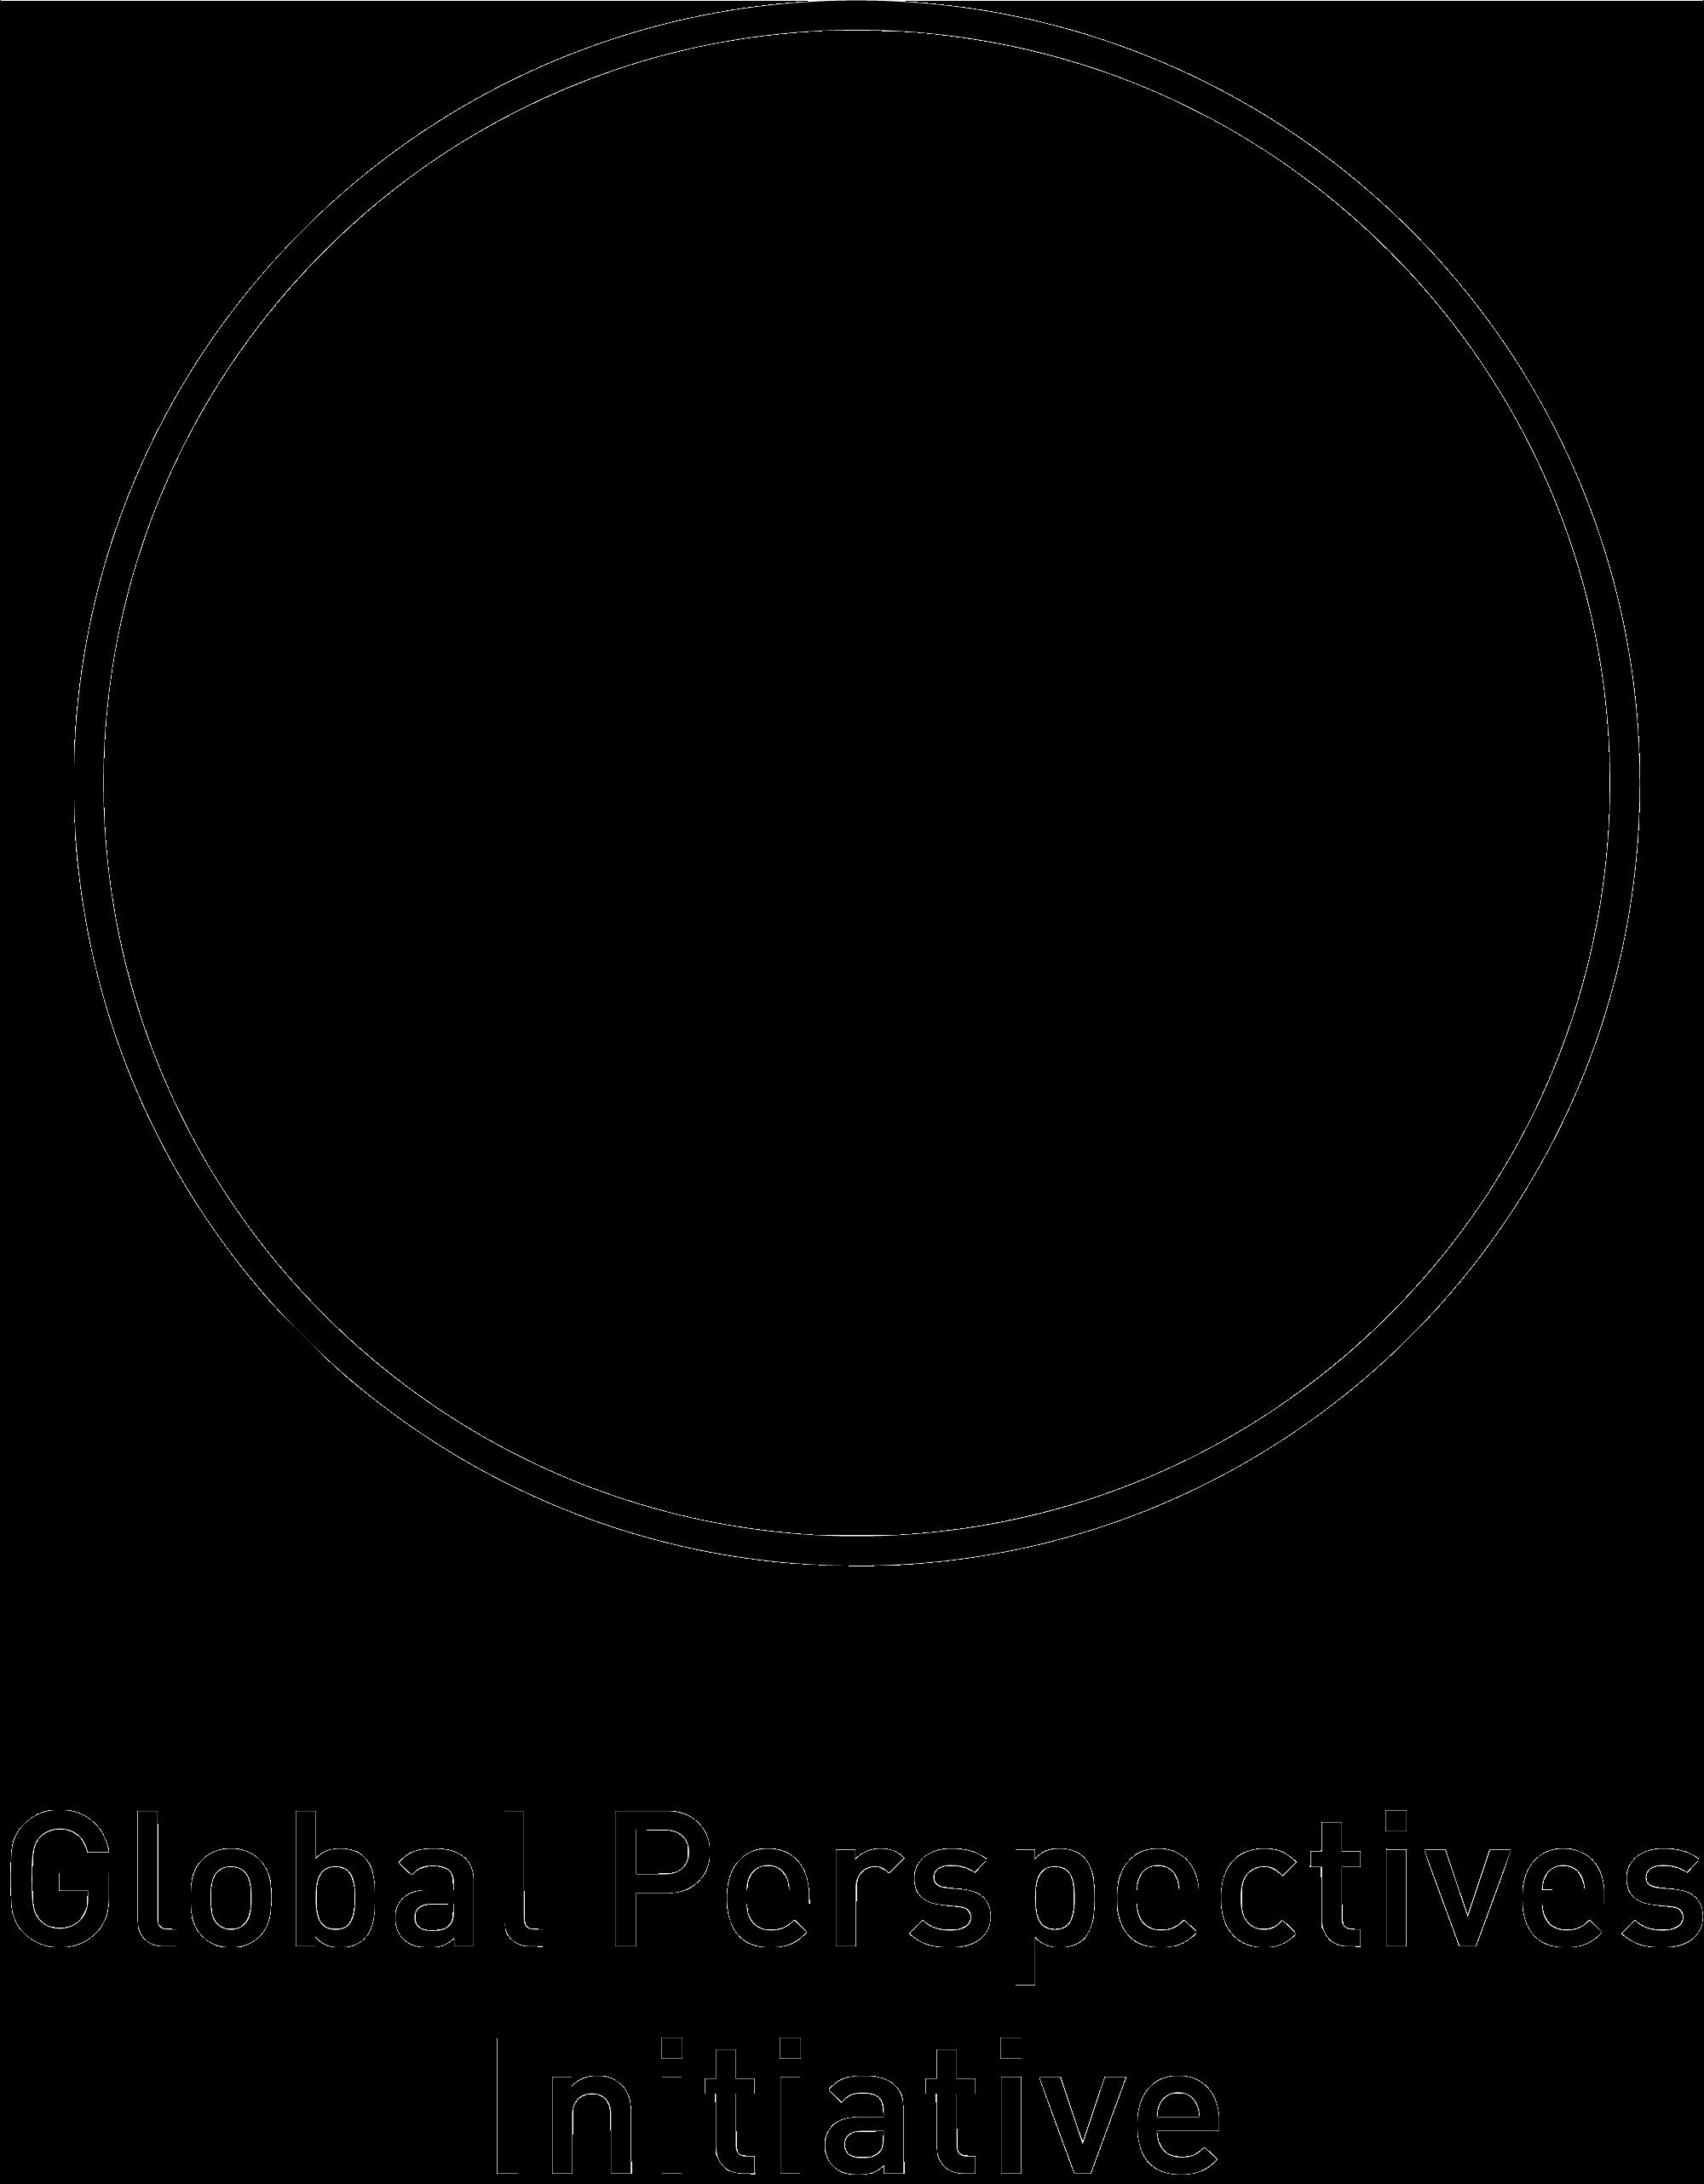 gpi_logo_wort-bildmarke_positiv.png